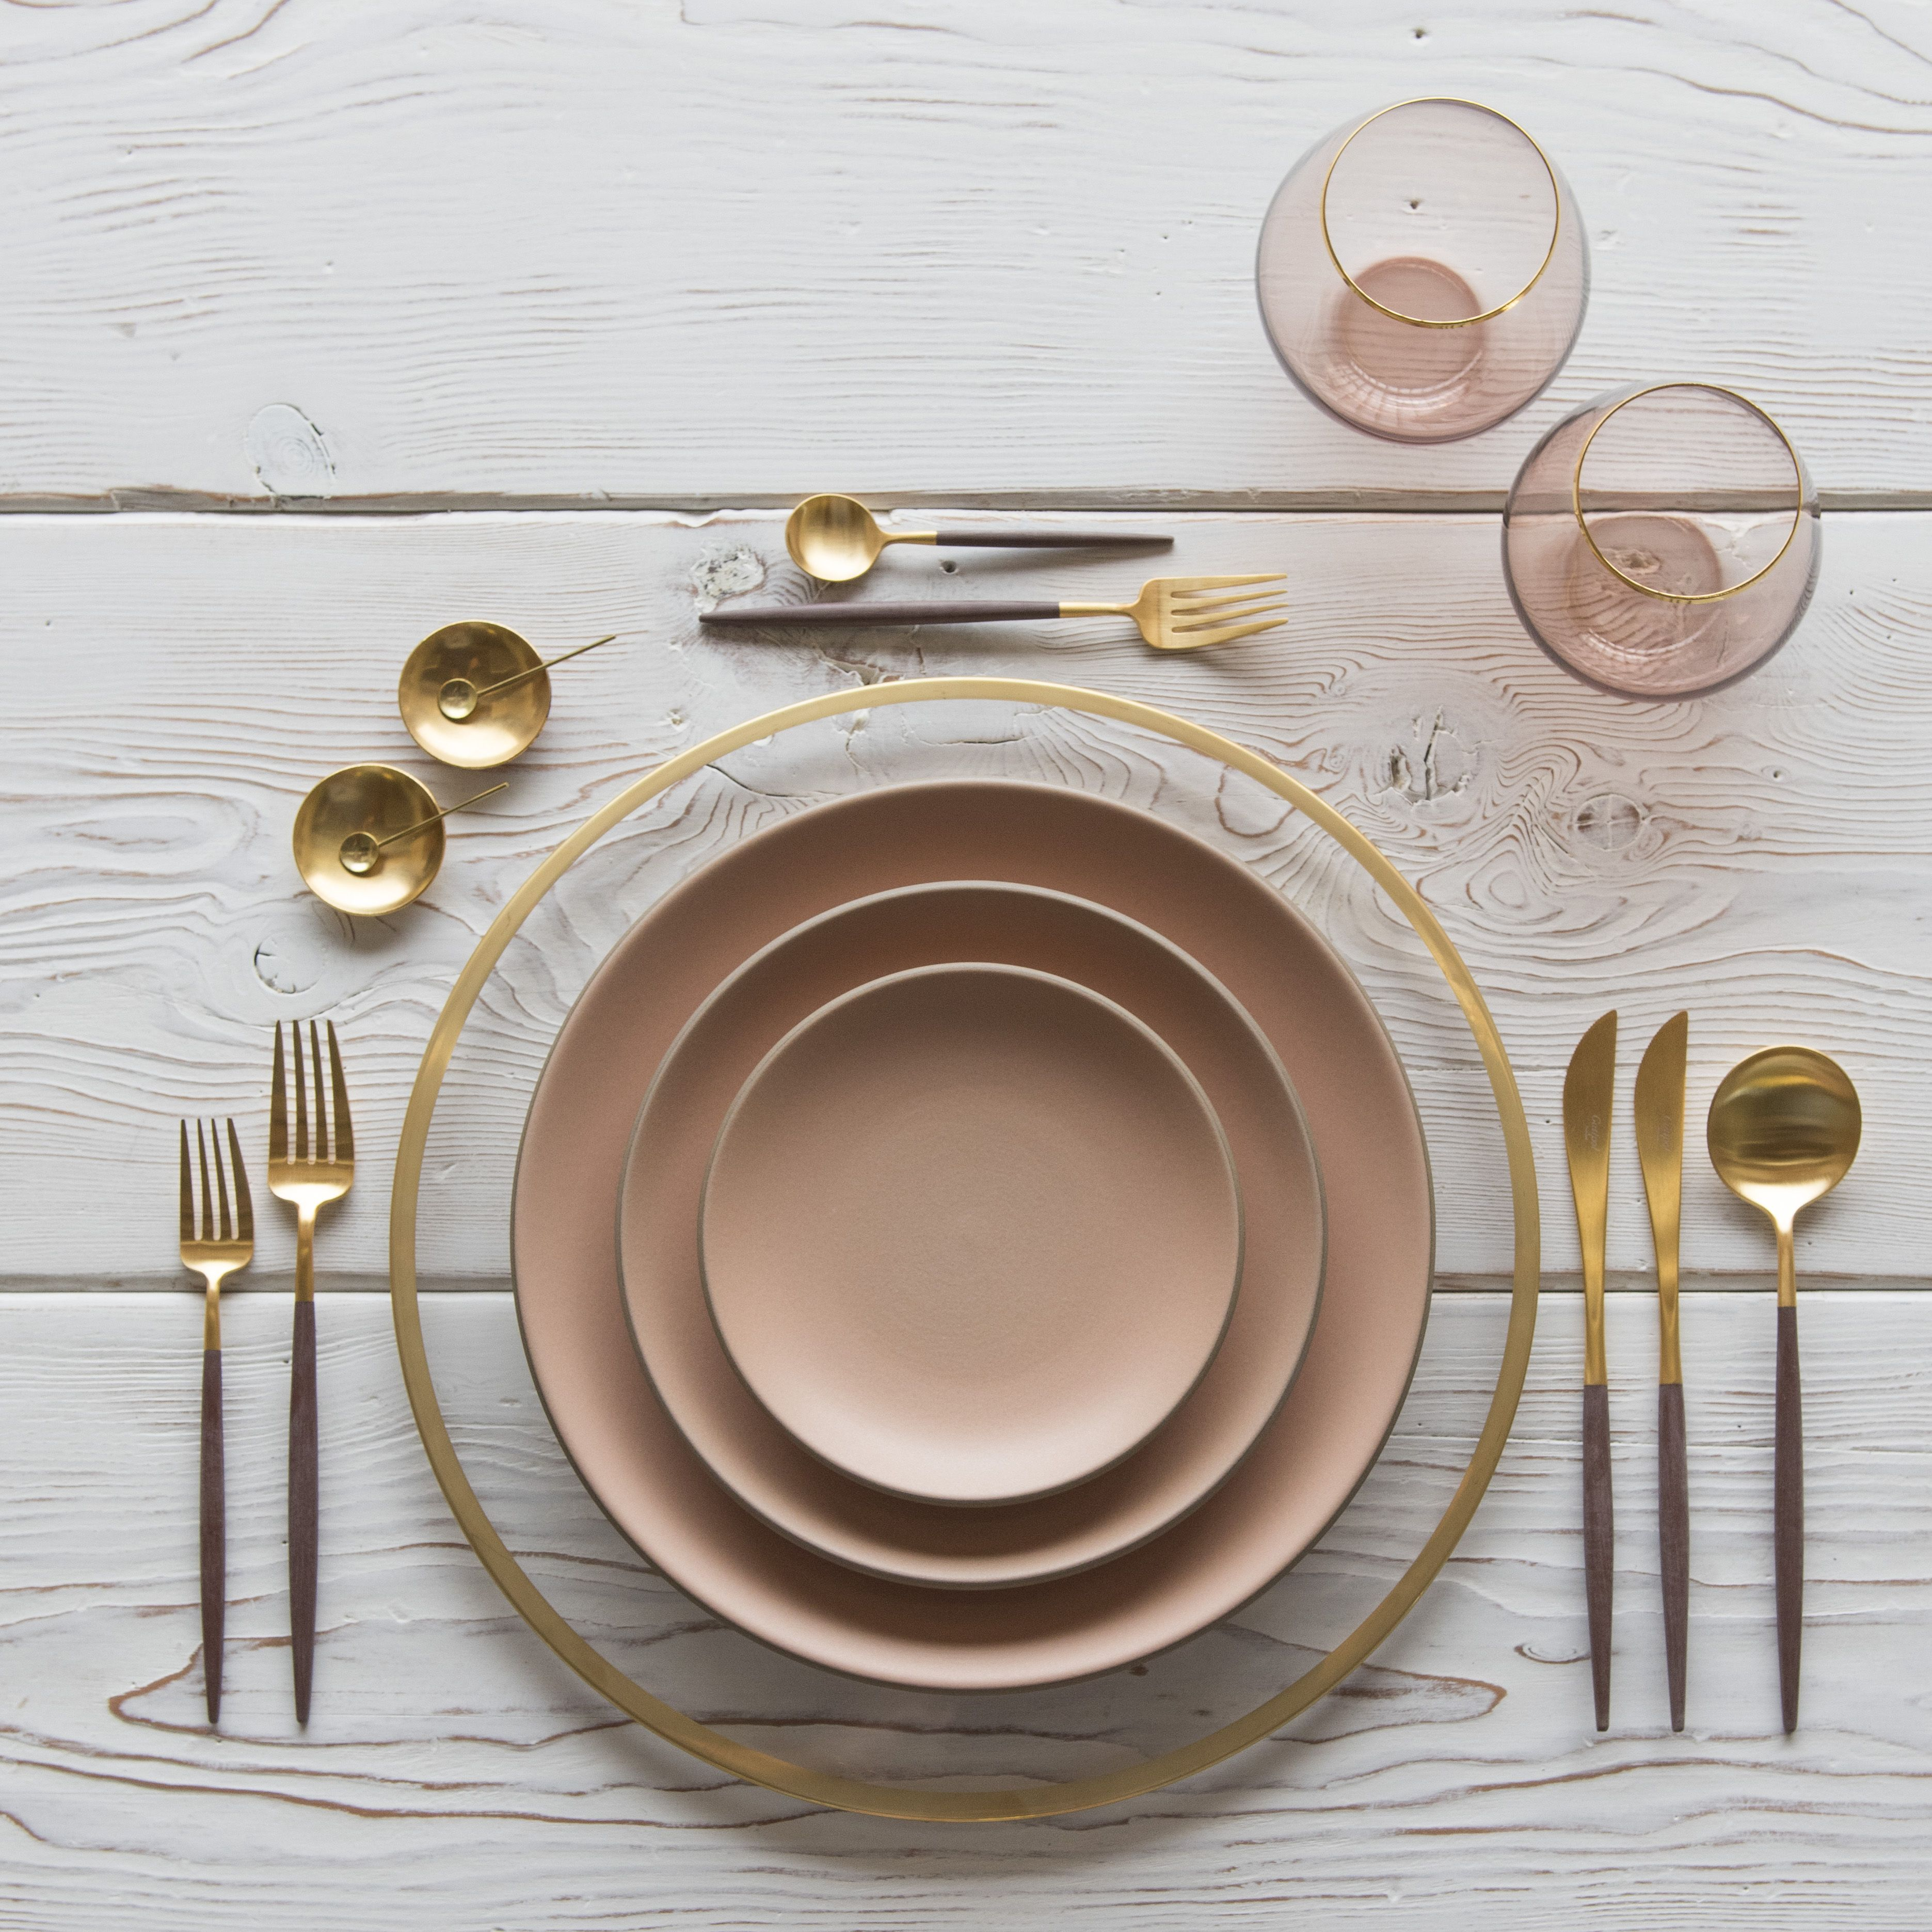 Decoraci n mesas cuberter a dorada con platos y for Utensilios modernos